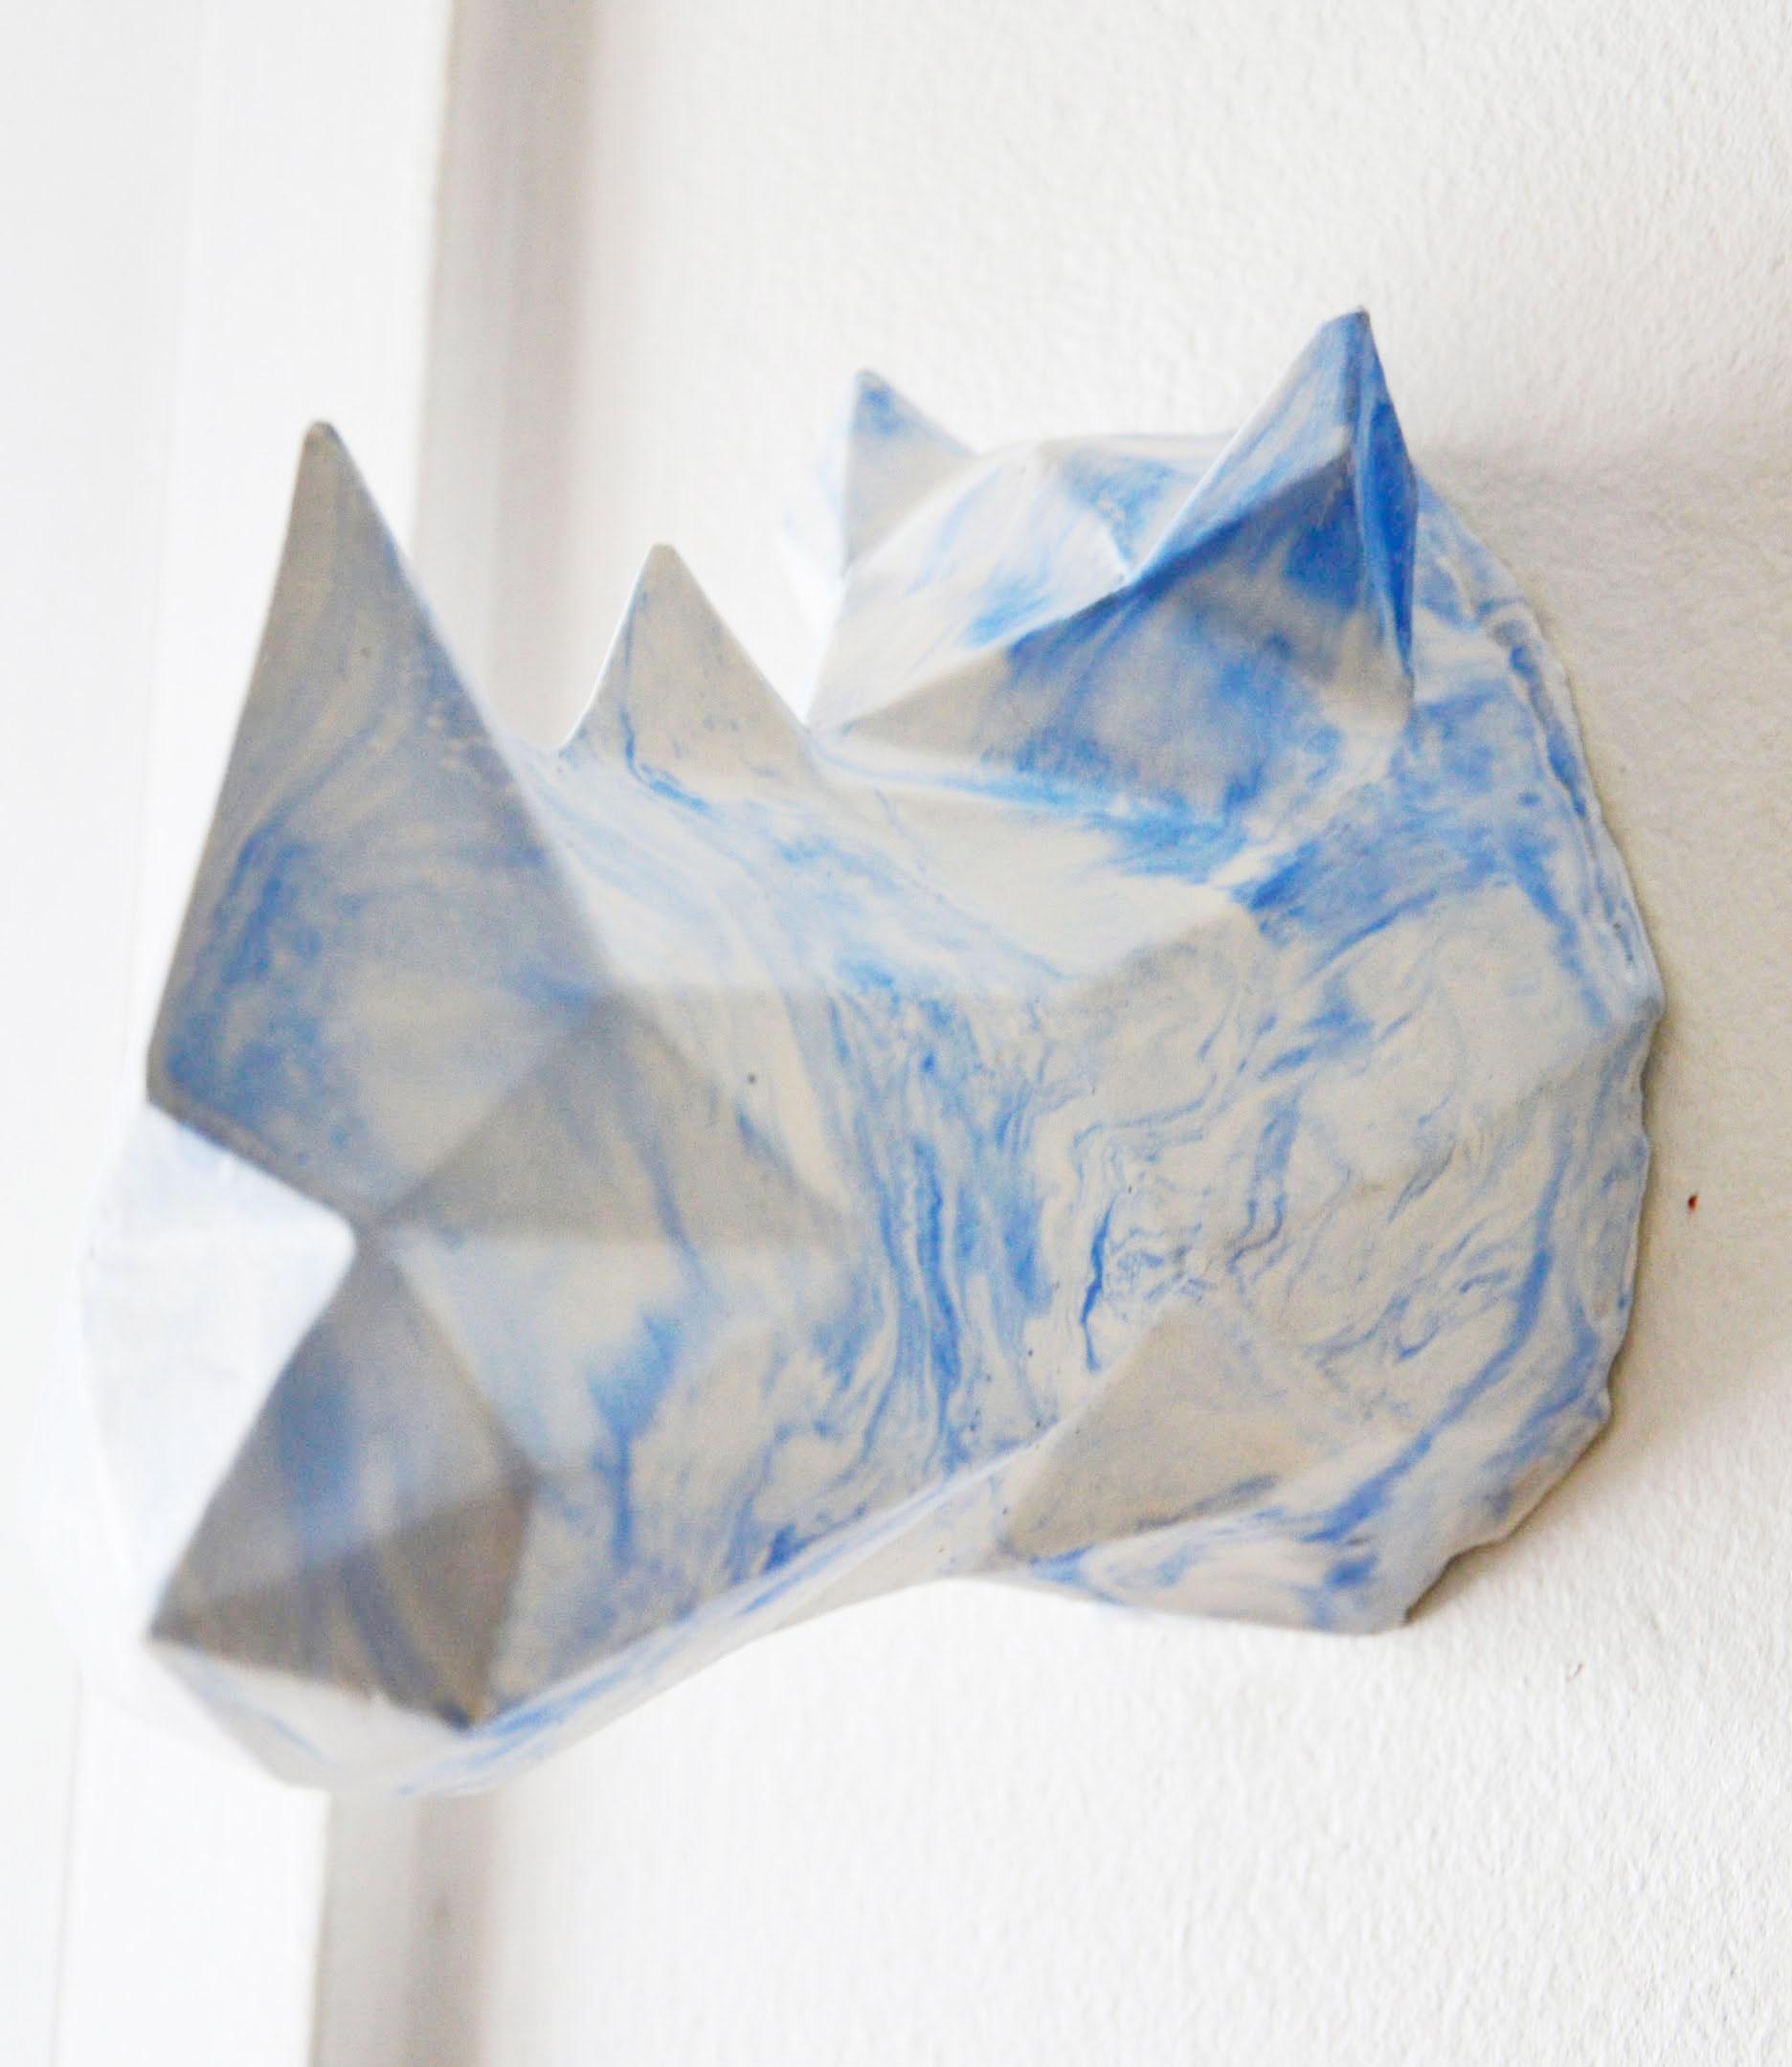 miss-cloudy-thomas-pagliuca-atelier-concrete-hunting-trophy-rhinoceros-5.jpg